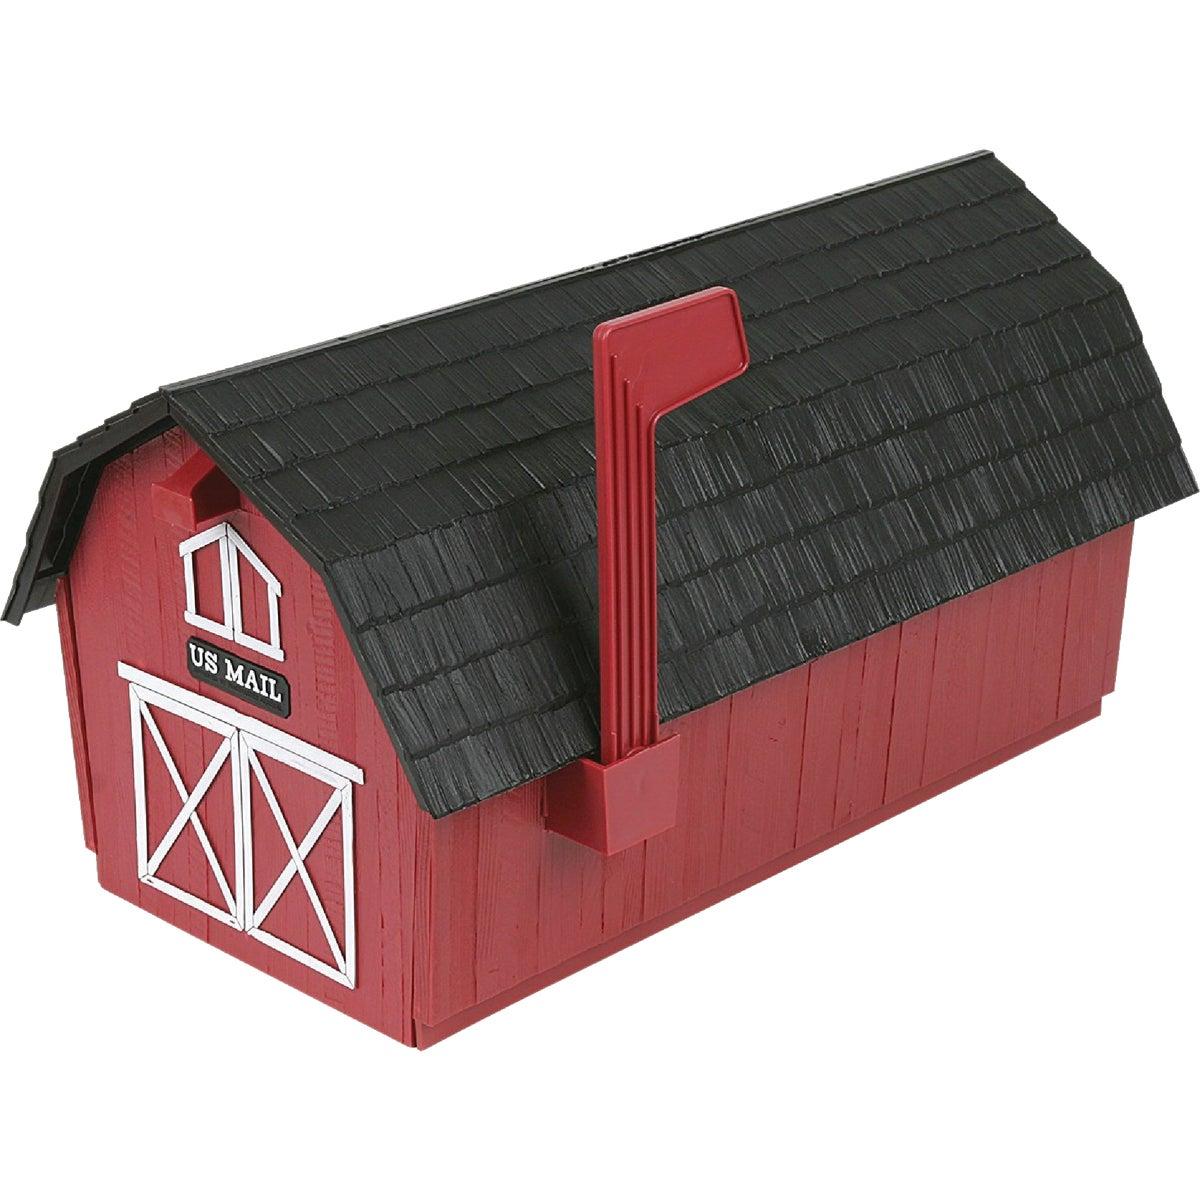 Flambeau T3 Barn Post Mount Mailbox